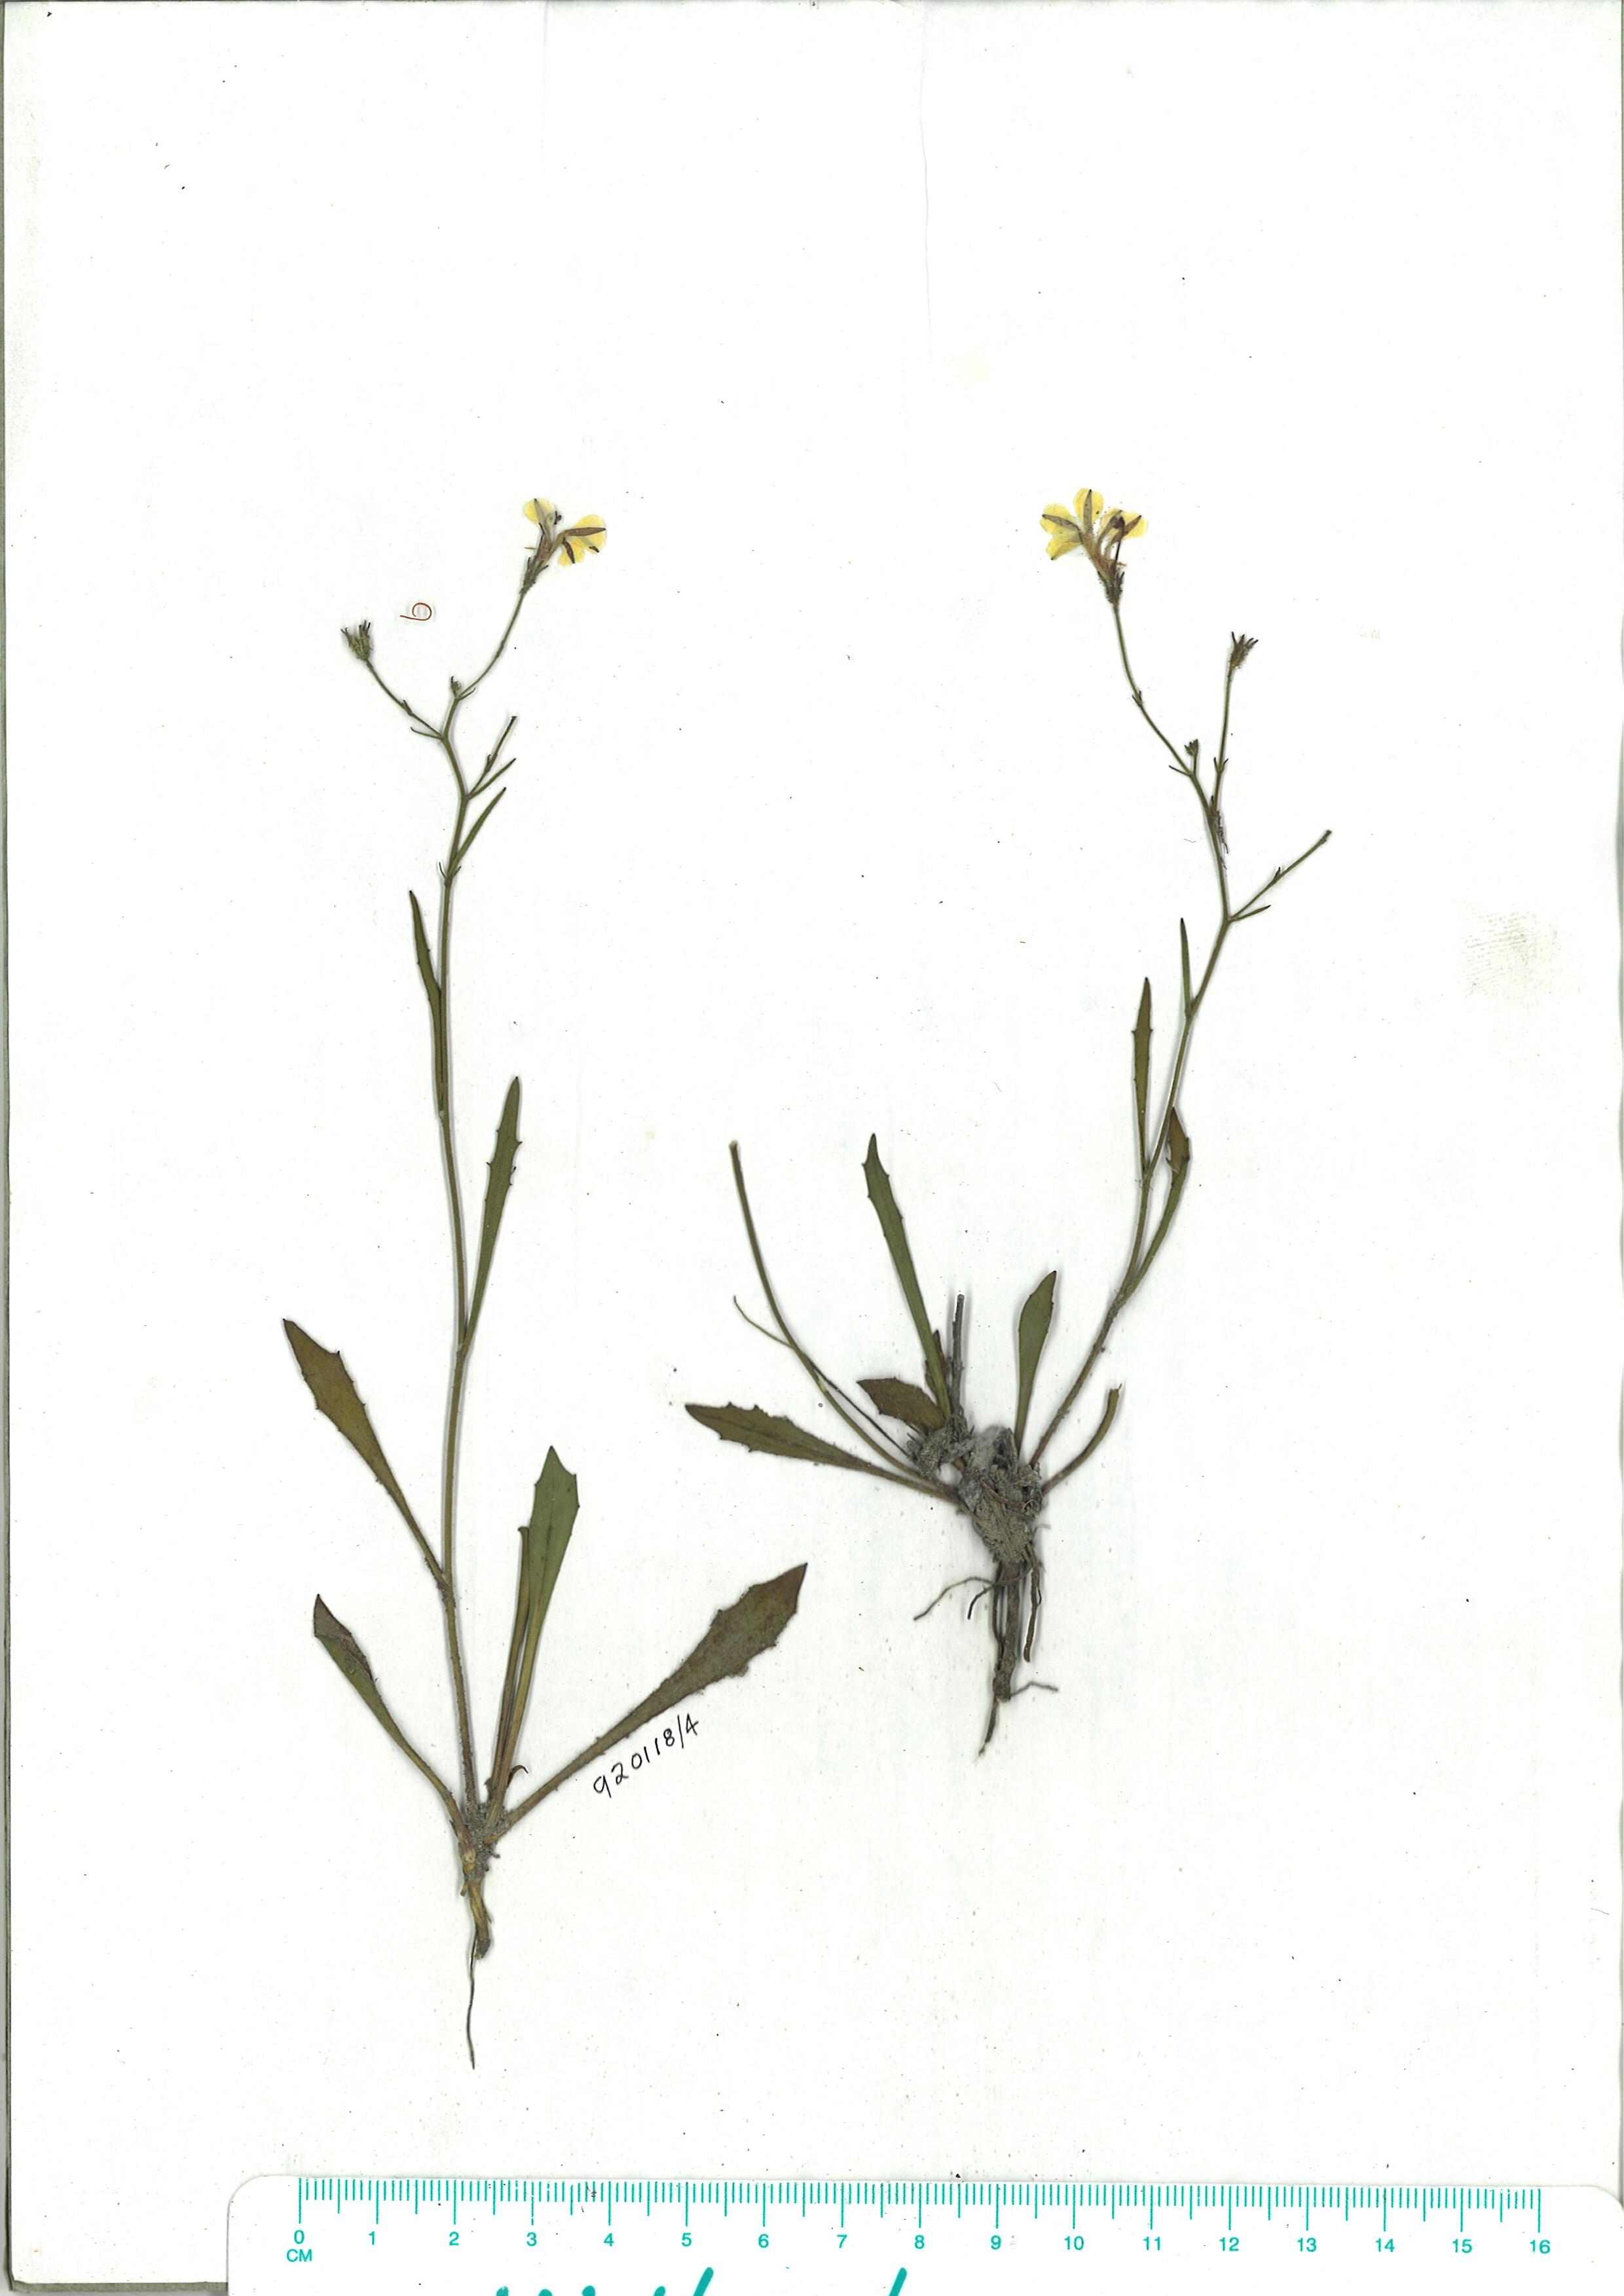 Scanned herbarium image of Goodenia paniculata